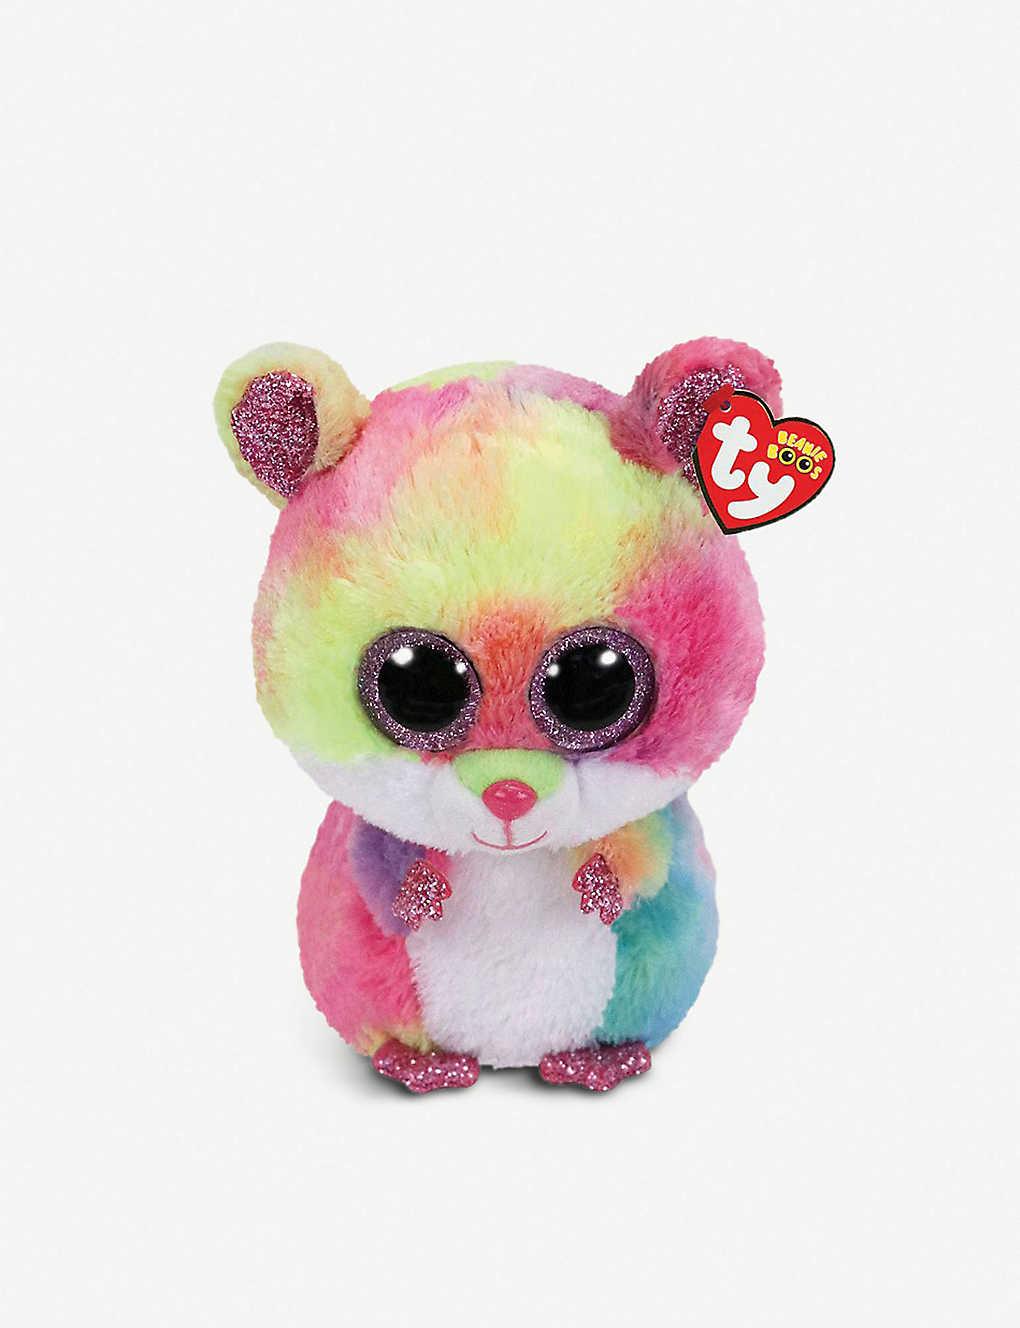 72618aa6809 TY - Beanie Boo Rodney hamster soft toy 10cm